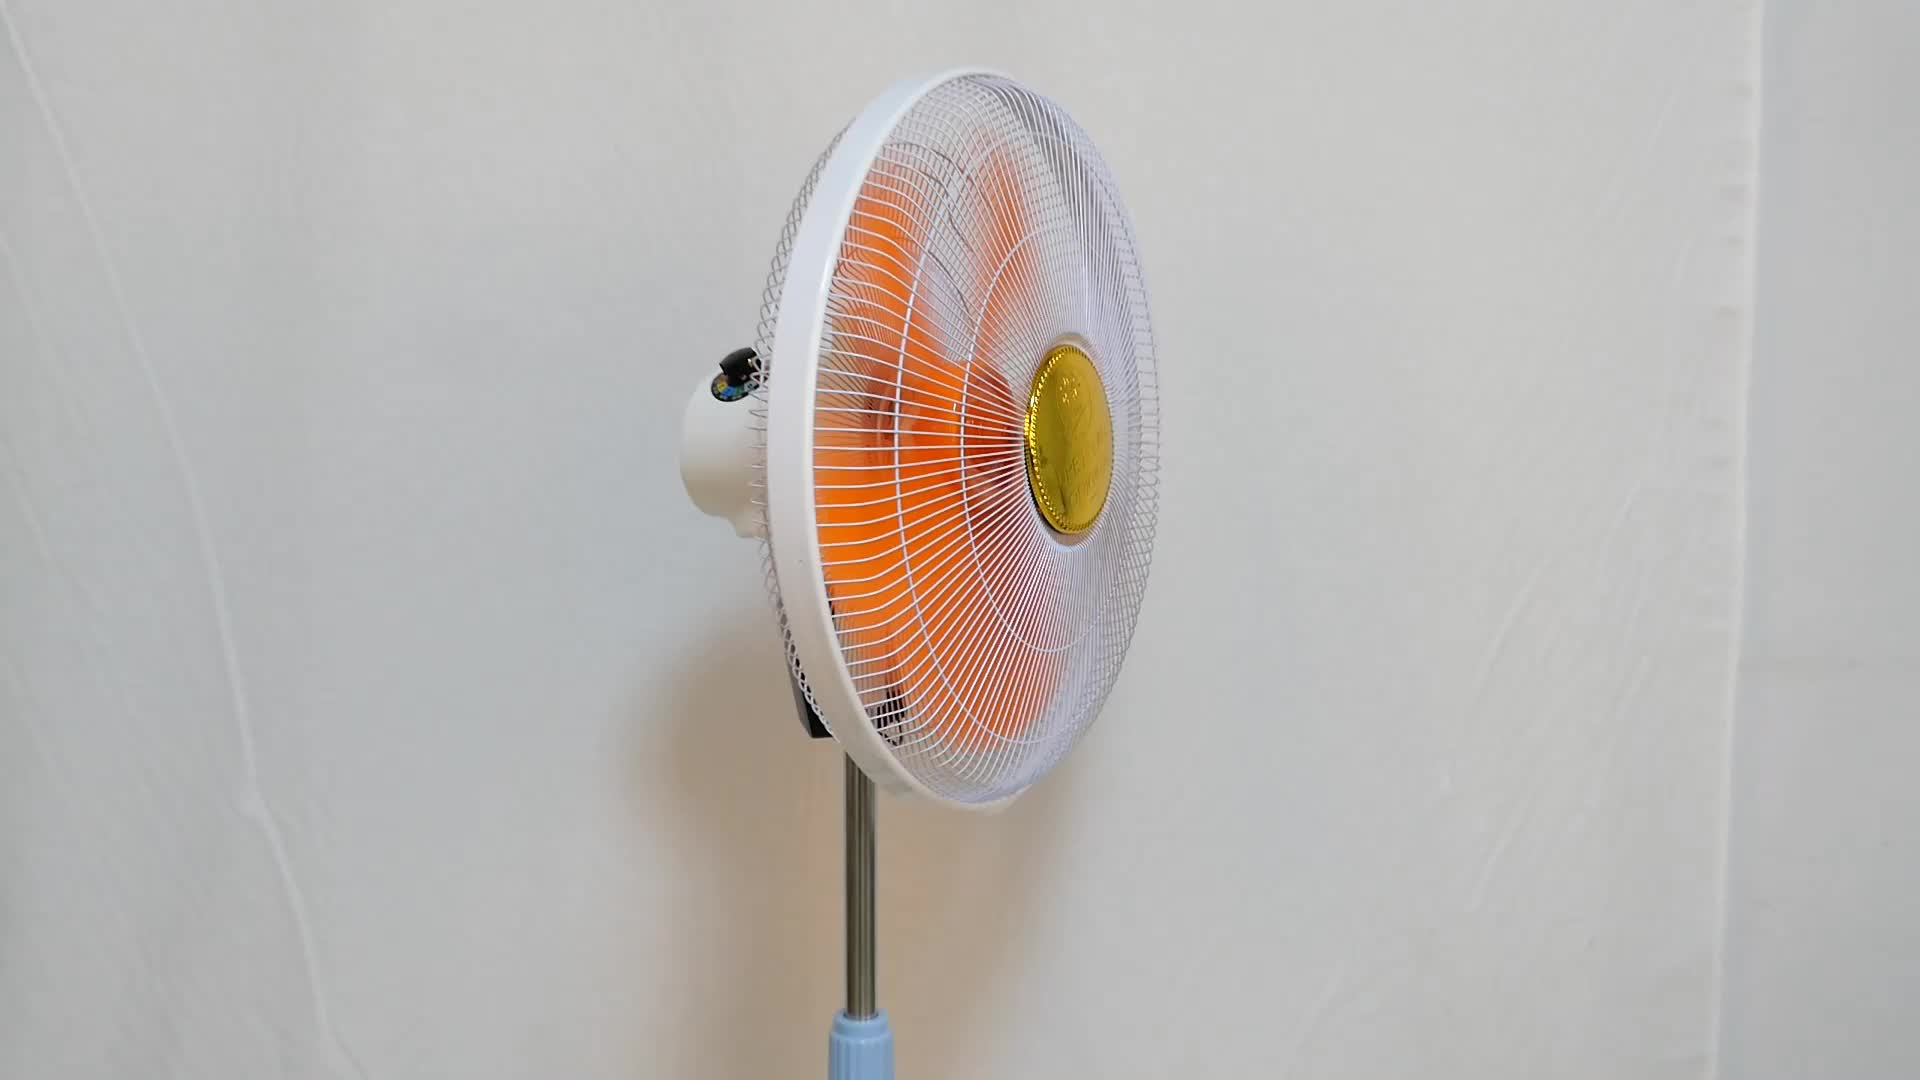 Güneş şarj plastik hava sirkülasyon ayaklı 12v Dc elektrikli Fan